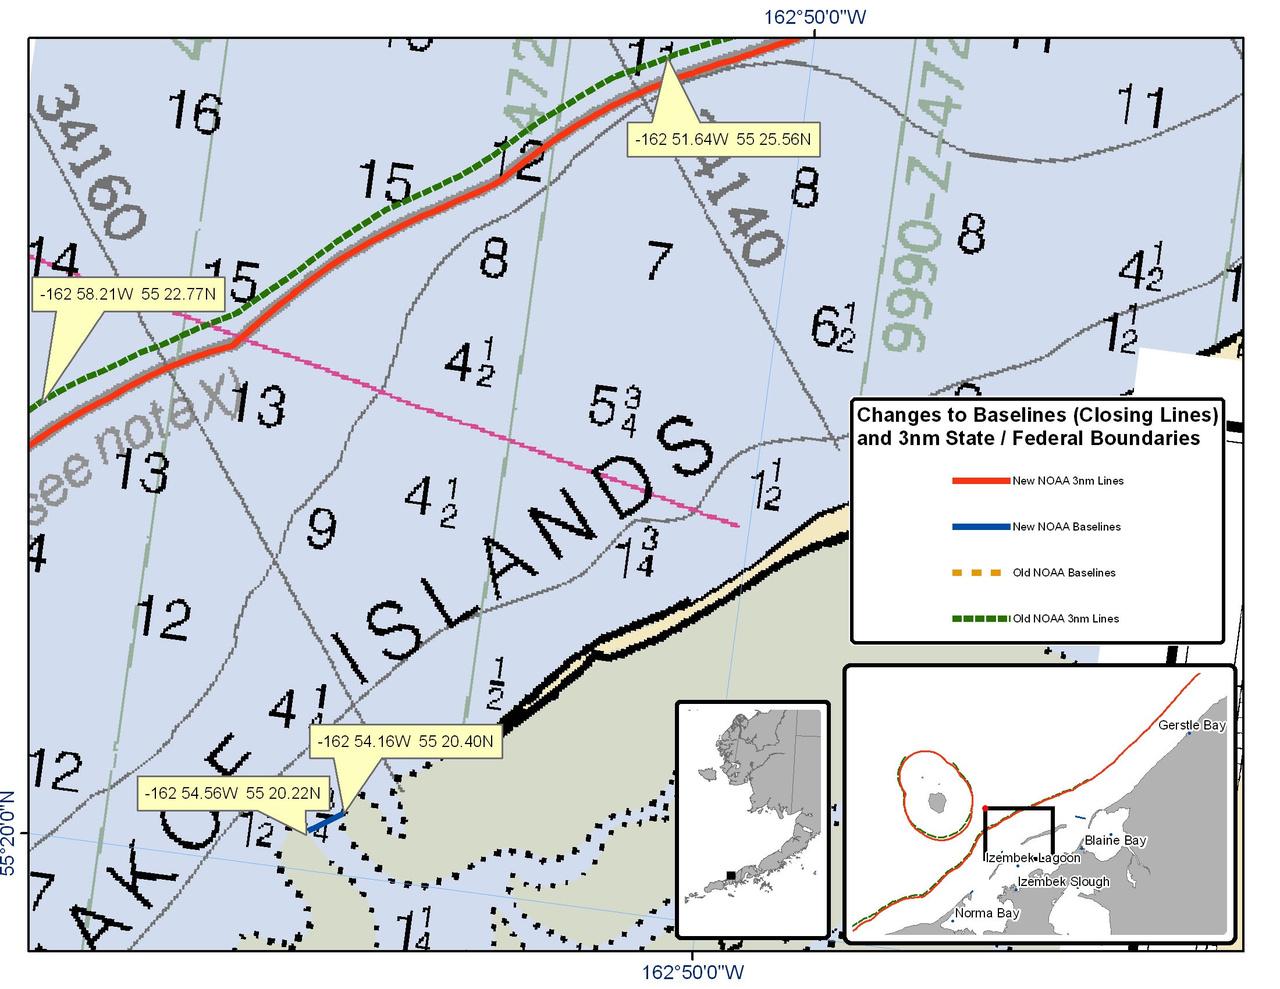 Chart for the Area surrounding Itzembek Lagoon